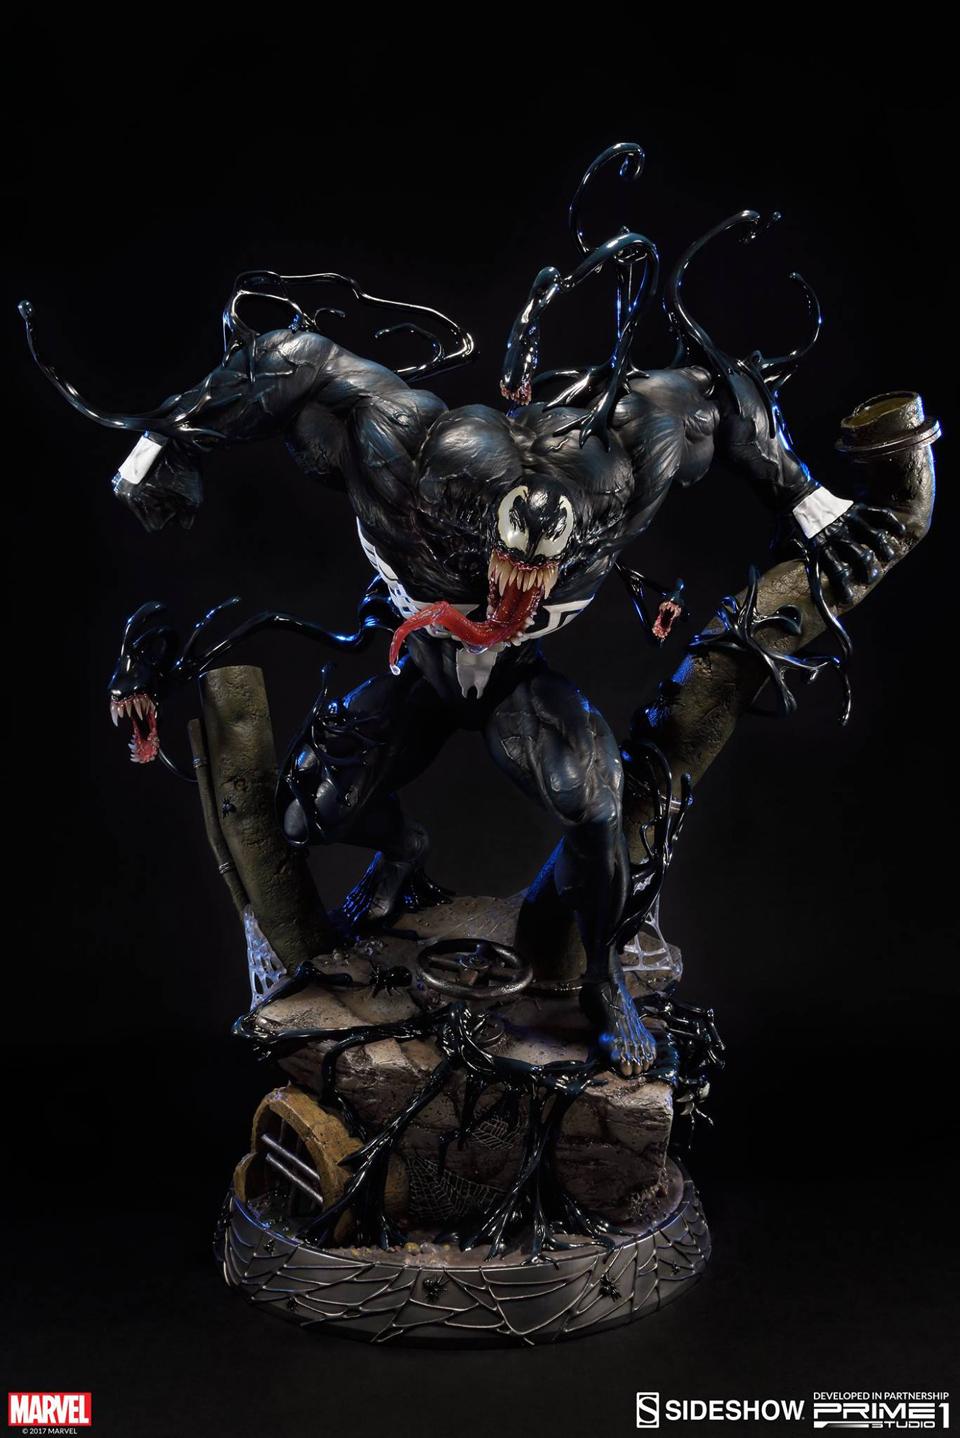 Prime 1 x Sideshow Venom: Dark Origin Statue